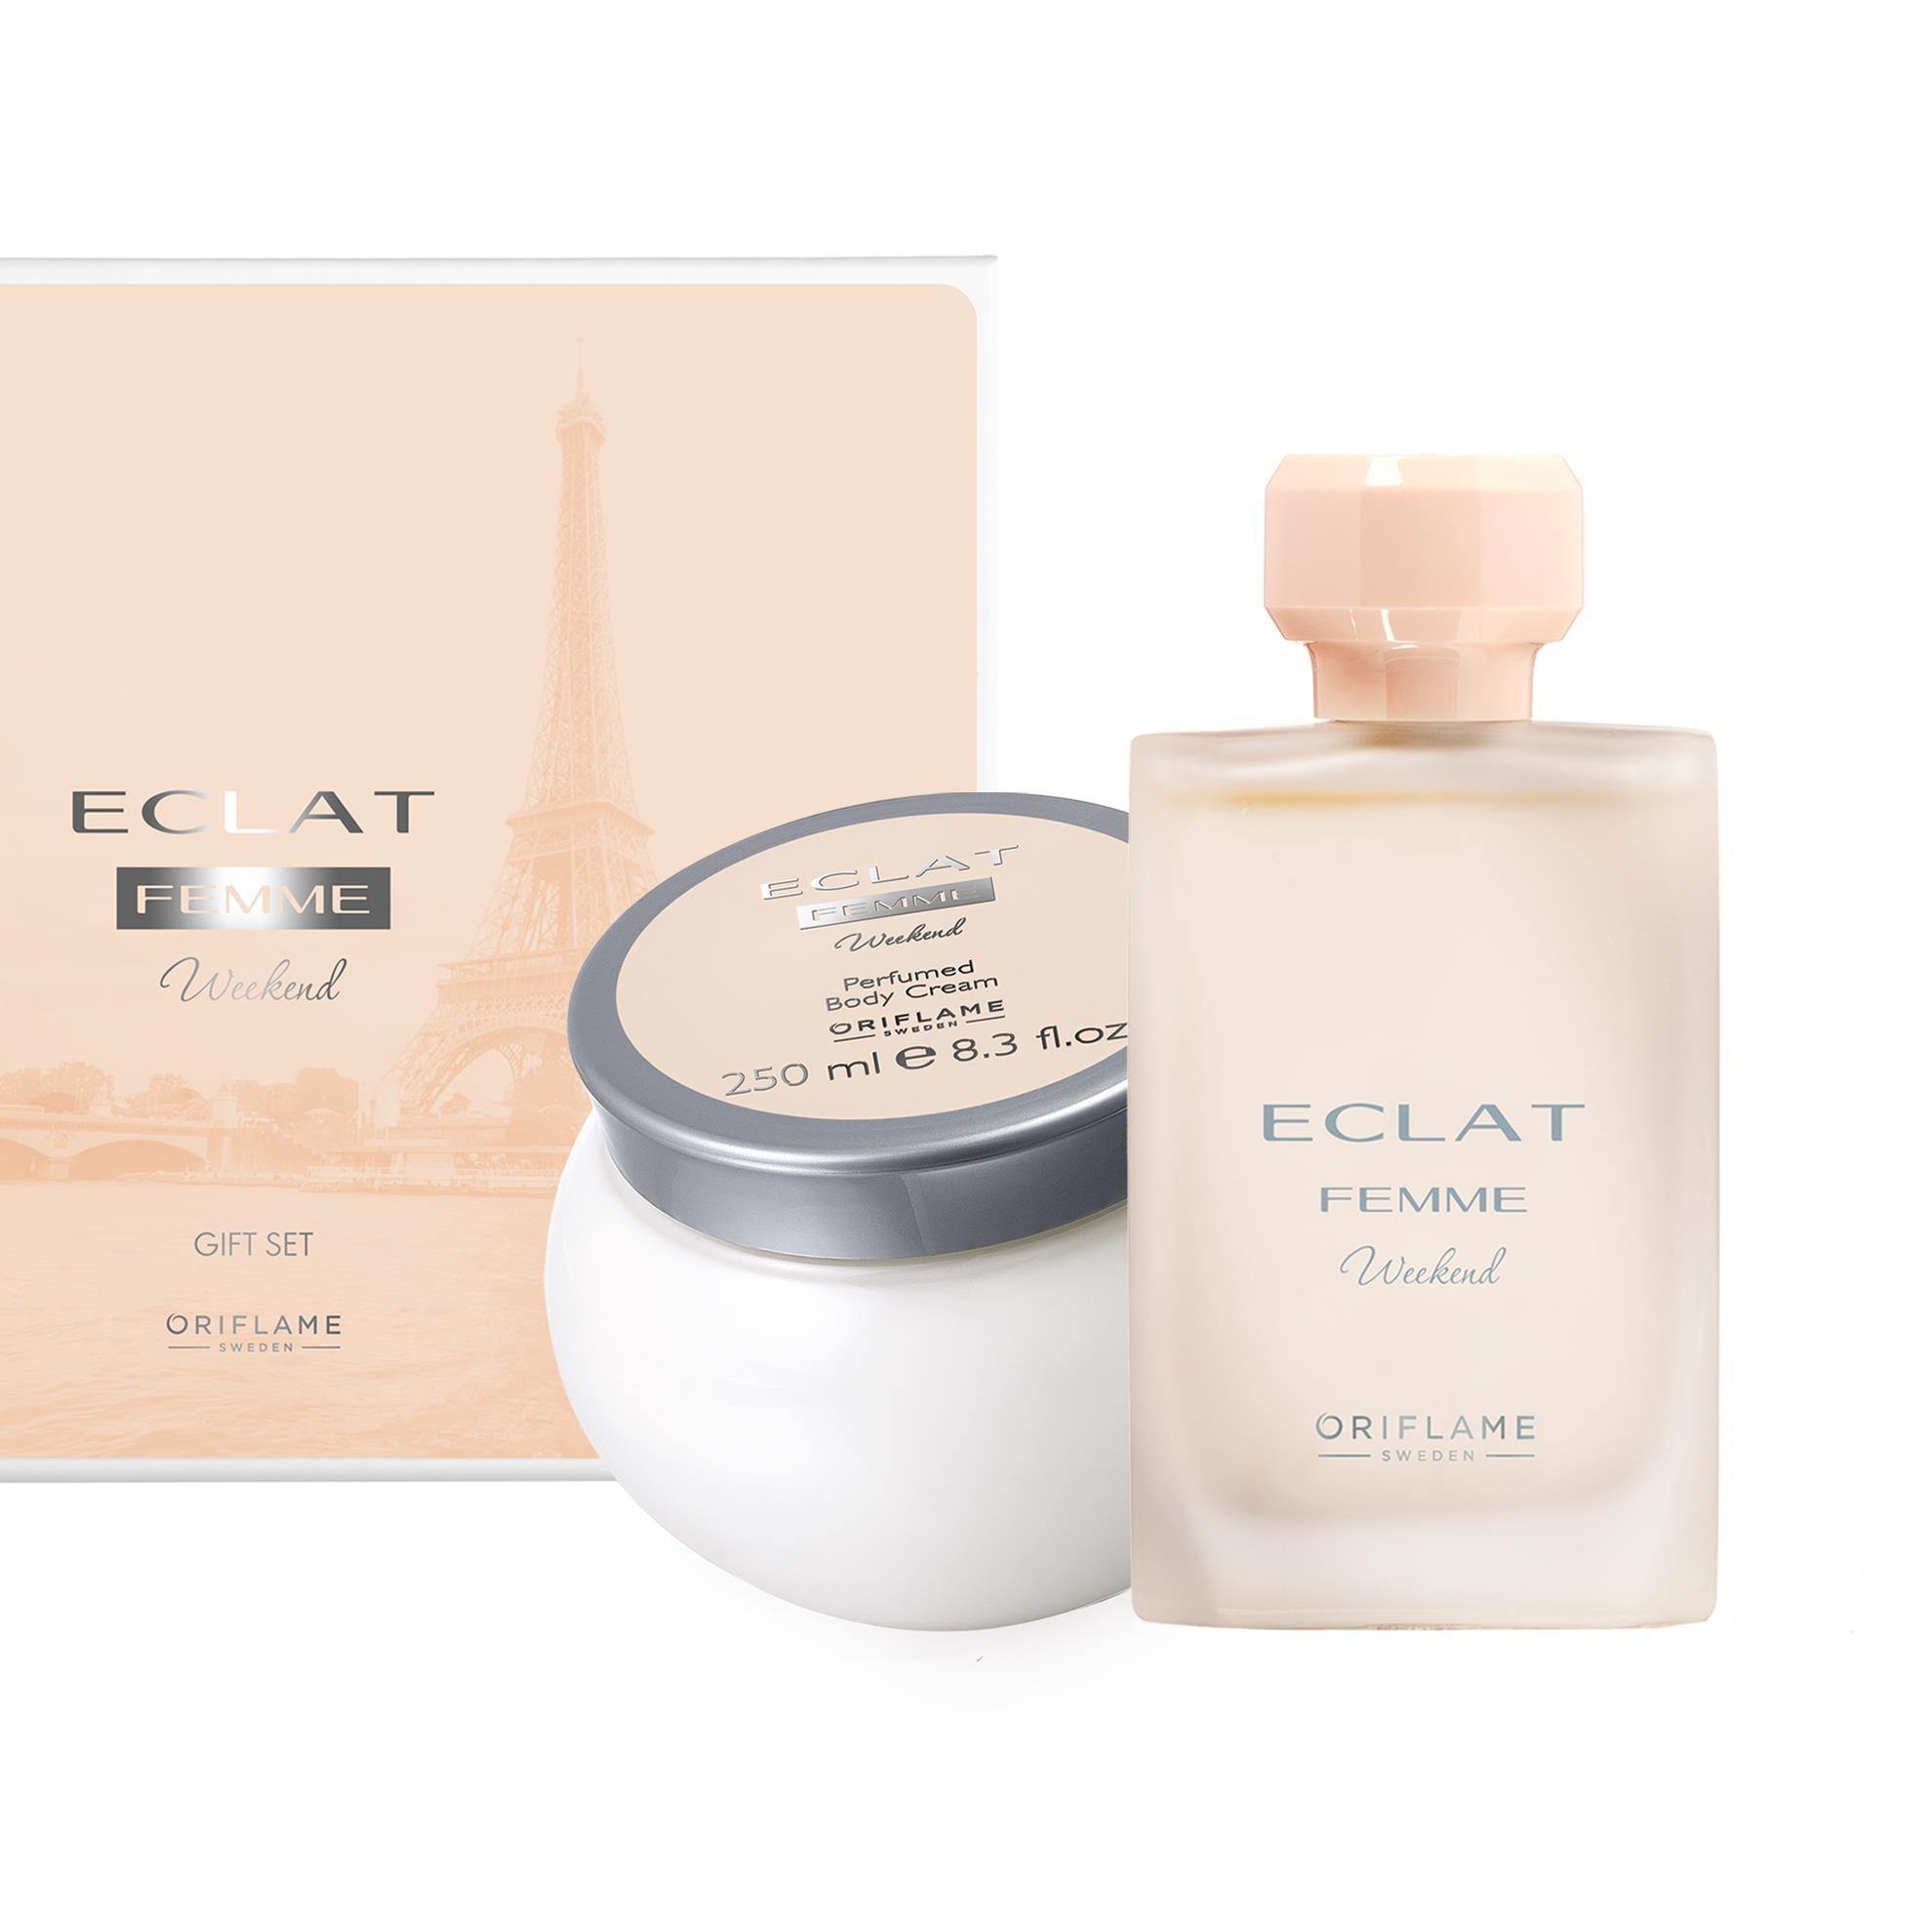 ست کرم بدن و ادوتویلت زنانه اکلت اوریفلیم ECLAT Femme Gift Set Oriflame